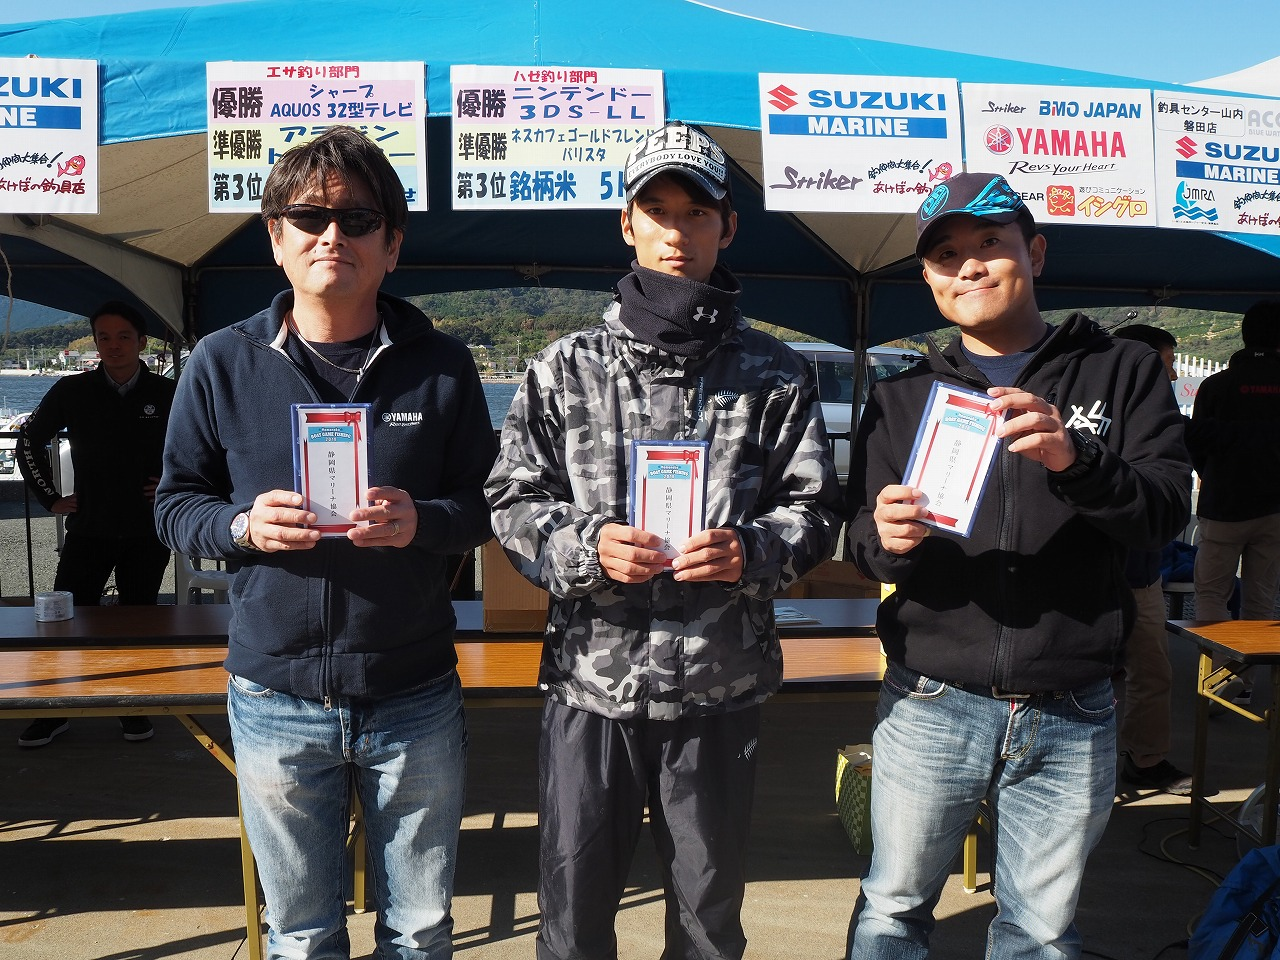 http://www.suzukimarine.co.jp/marina/hamanako/blog/img/%E3%82%AA%E3%83%AA%E3%83%B3%E3%83%91%E3%82%B9%20238.jpg